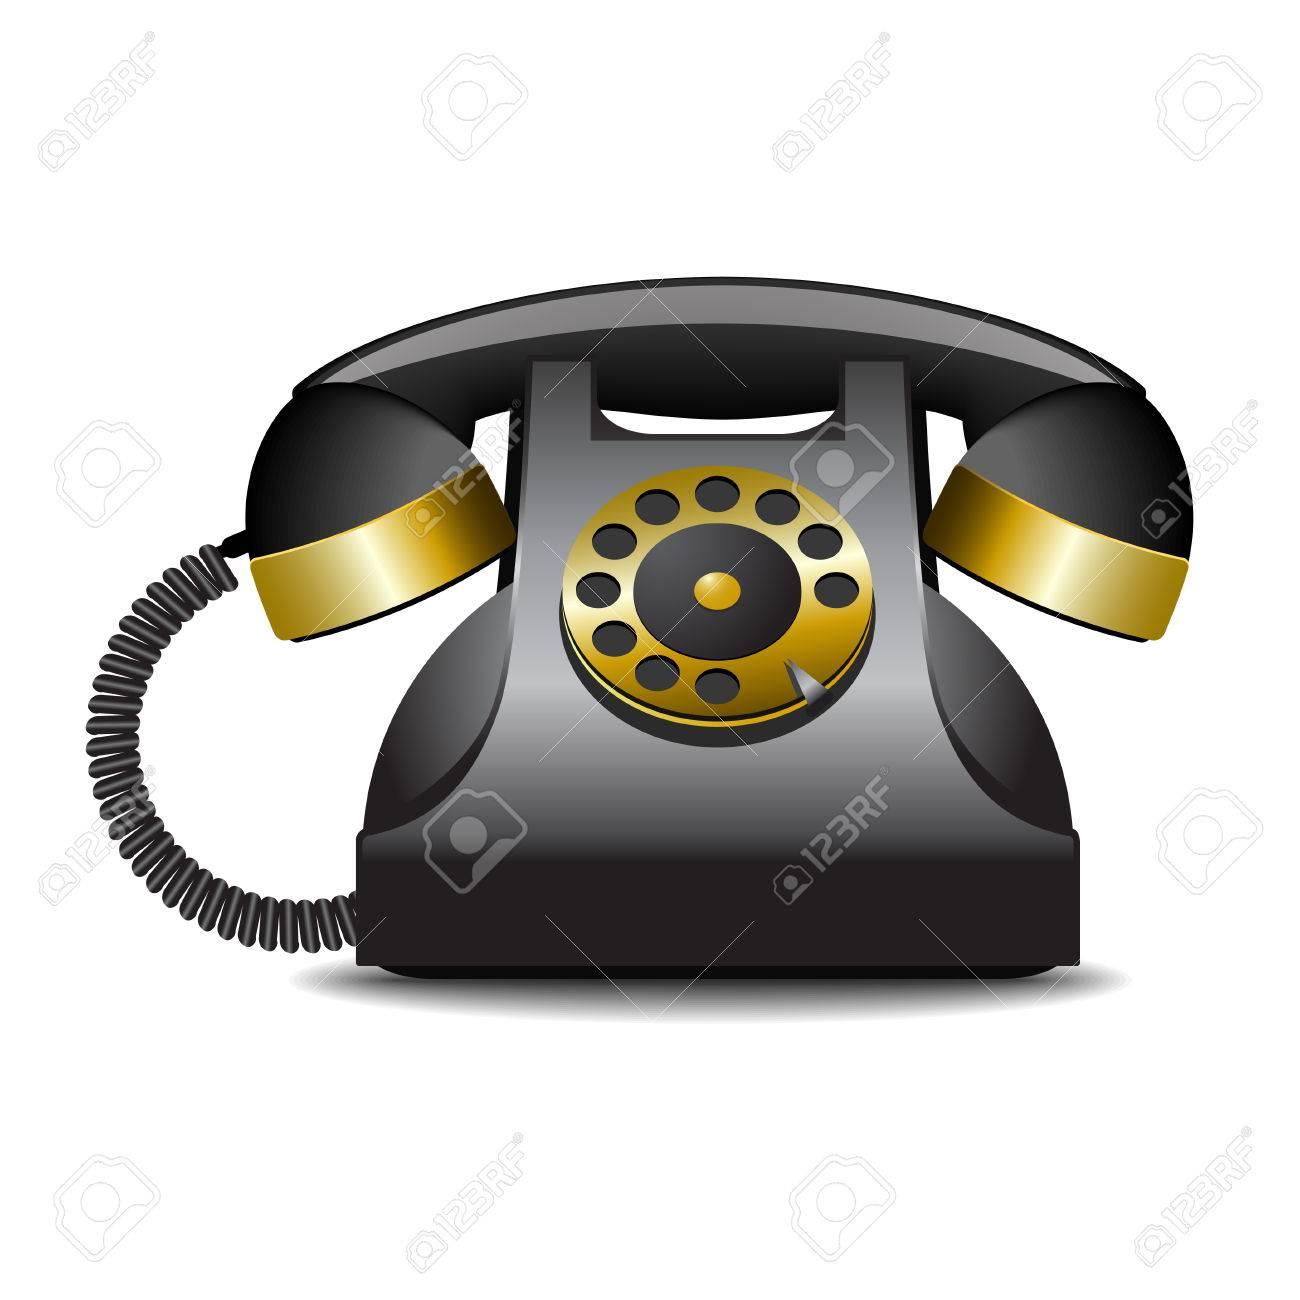 Telephone vector Stock Vector - 5967006